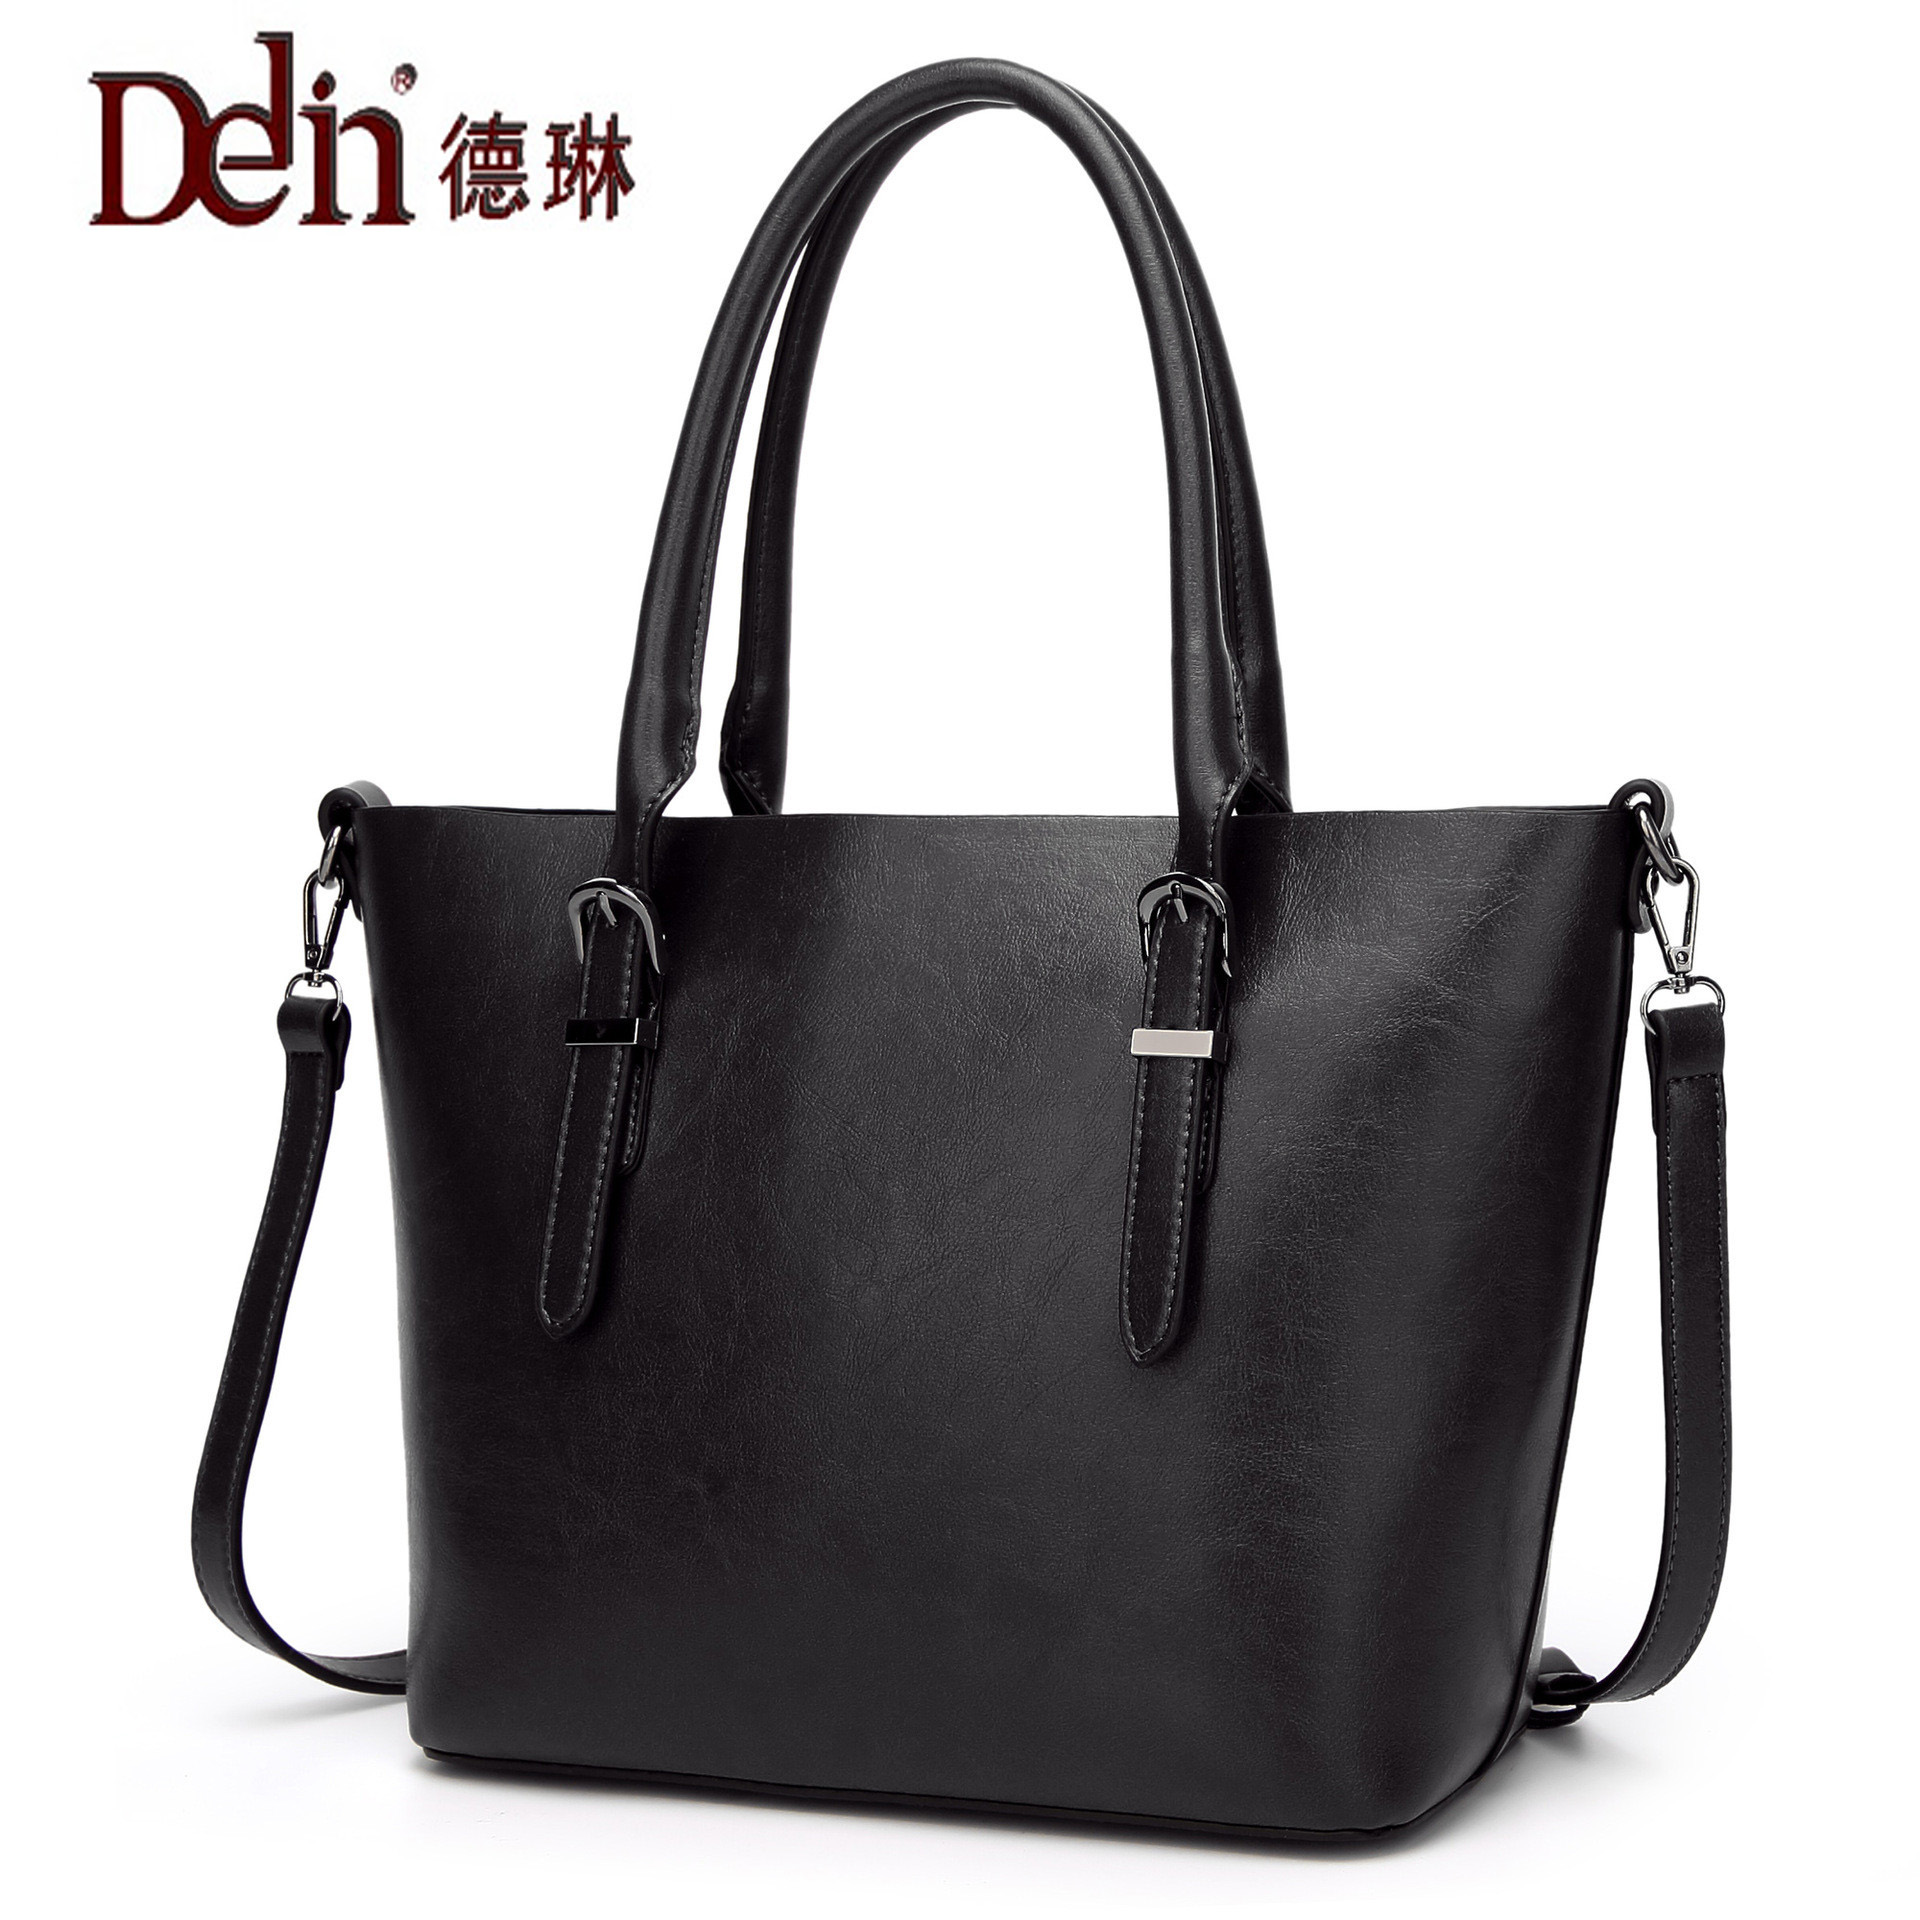 DELIN Manufacturers selling 2017 new fashion tote bag fashion large capacity single shoulder bag handbag